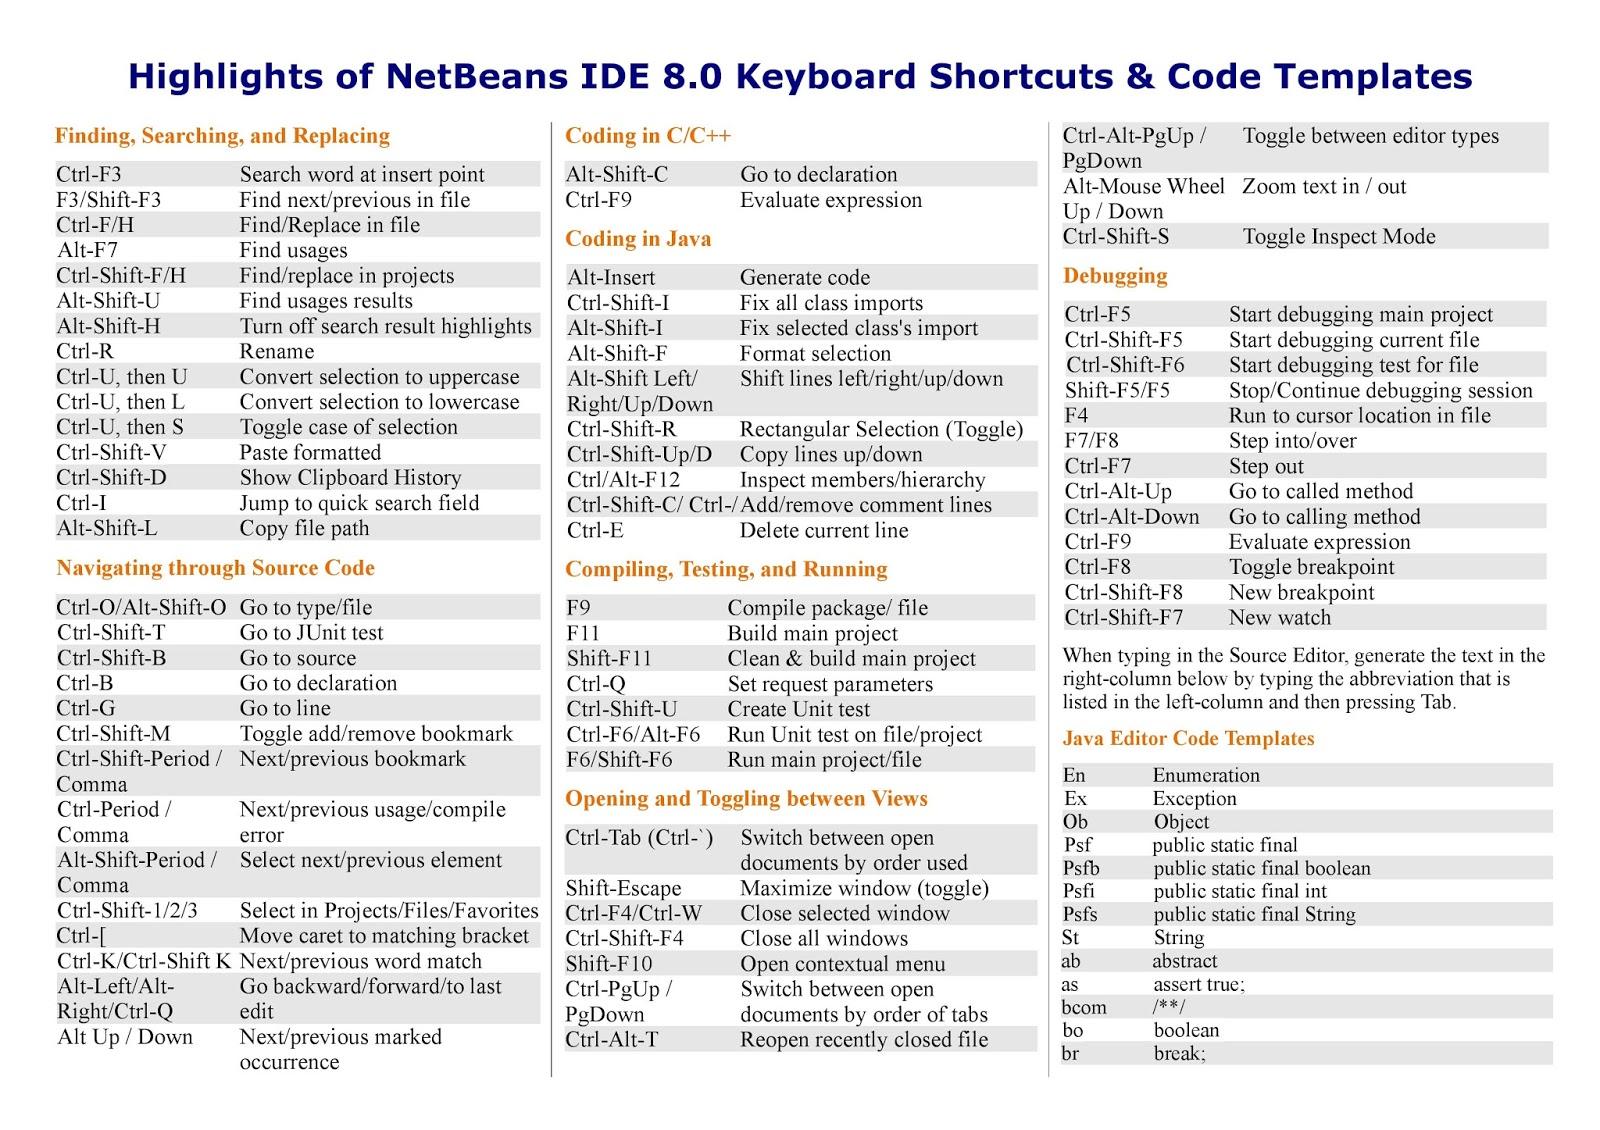 NetBeans KeyBoard Shortcuts - C#, JAVA,PHP, Programming